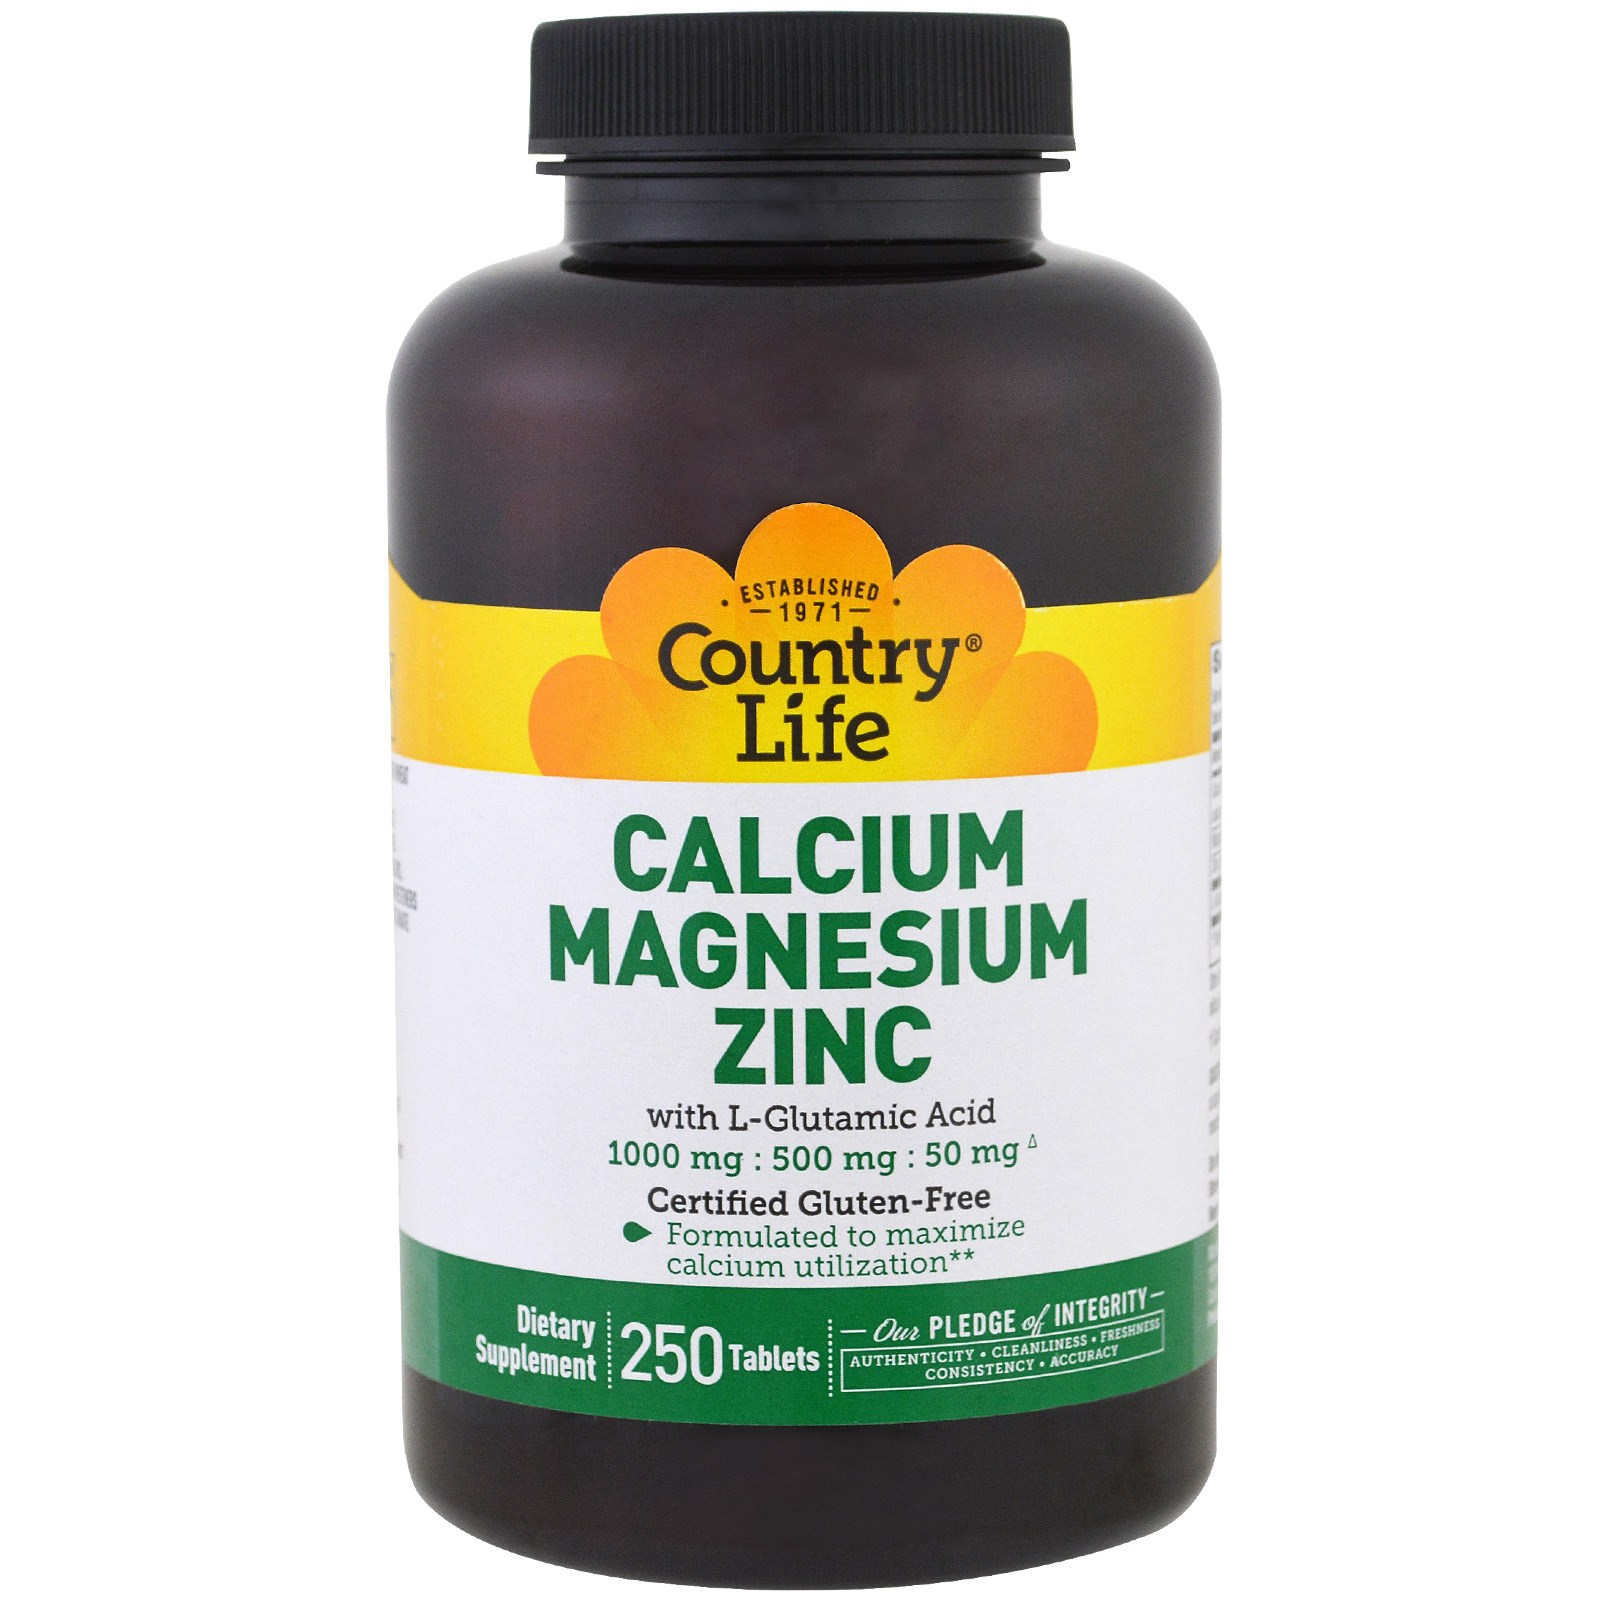 Country Life Calcium Magnesium Zinc 250 Tablets